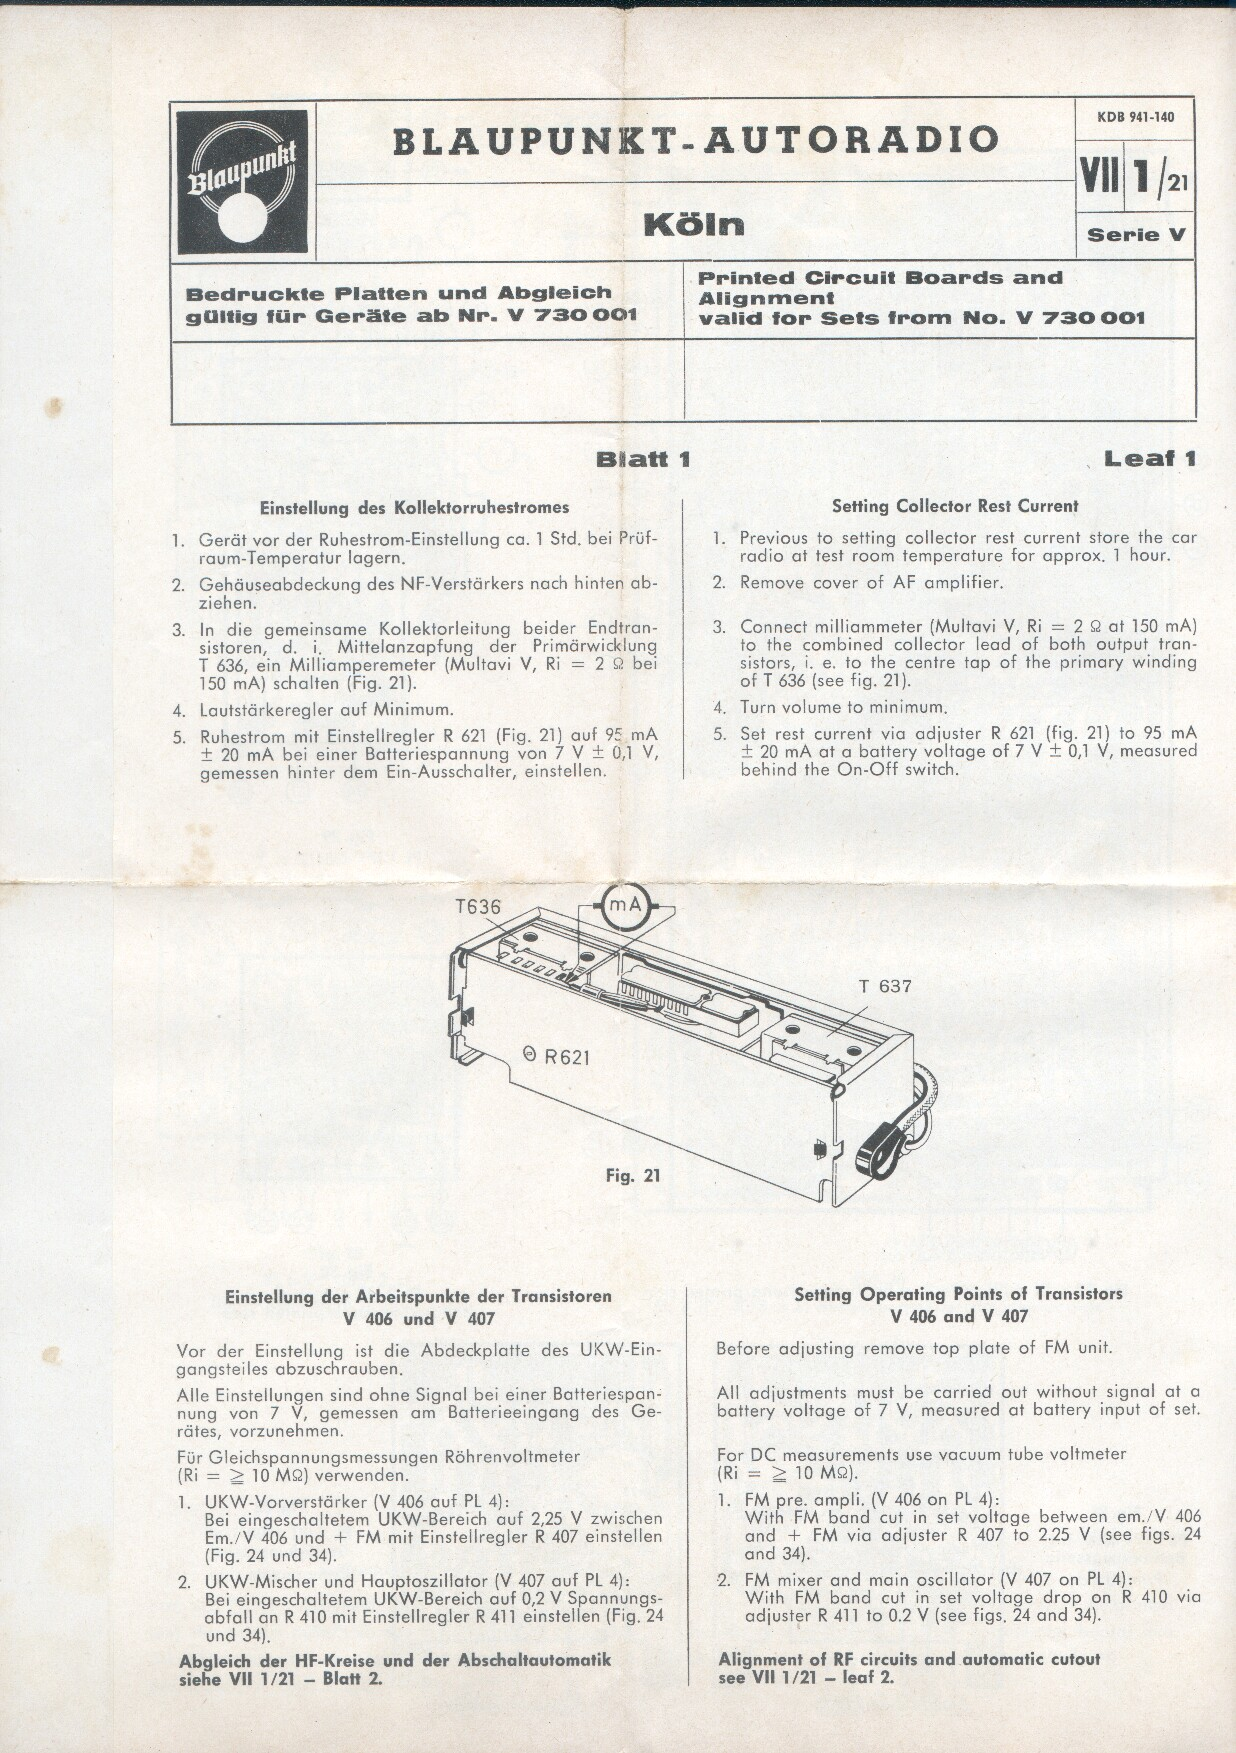 1965 Blaupunkt Koln Schematics Circuit Board Printed And Alignment